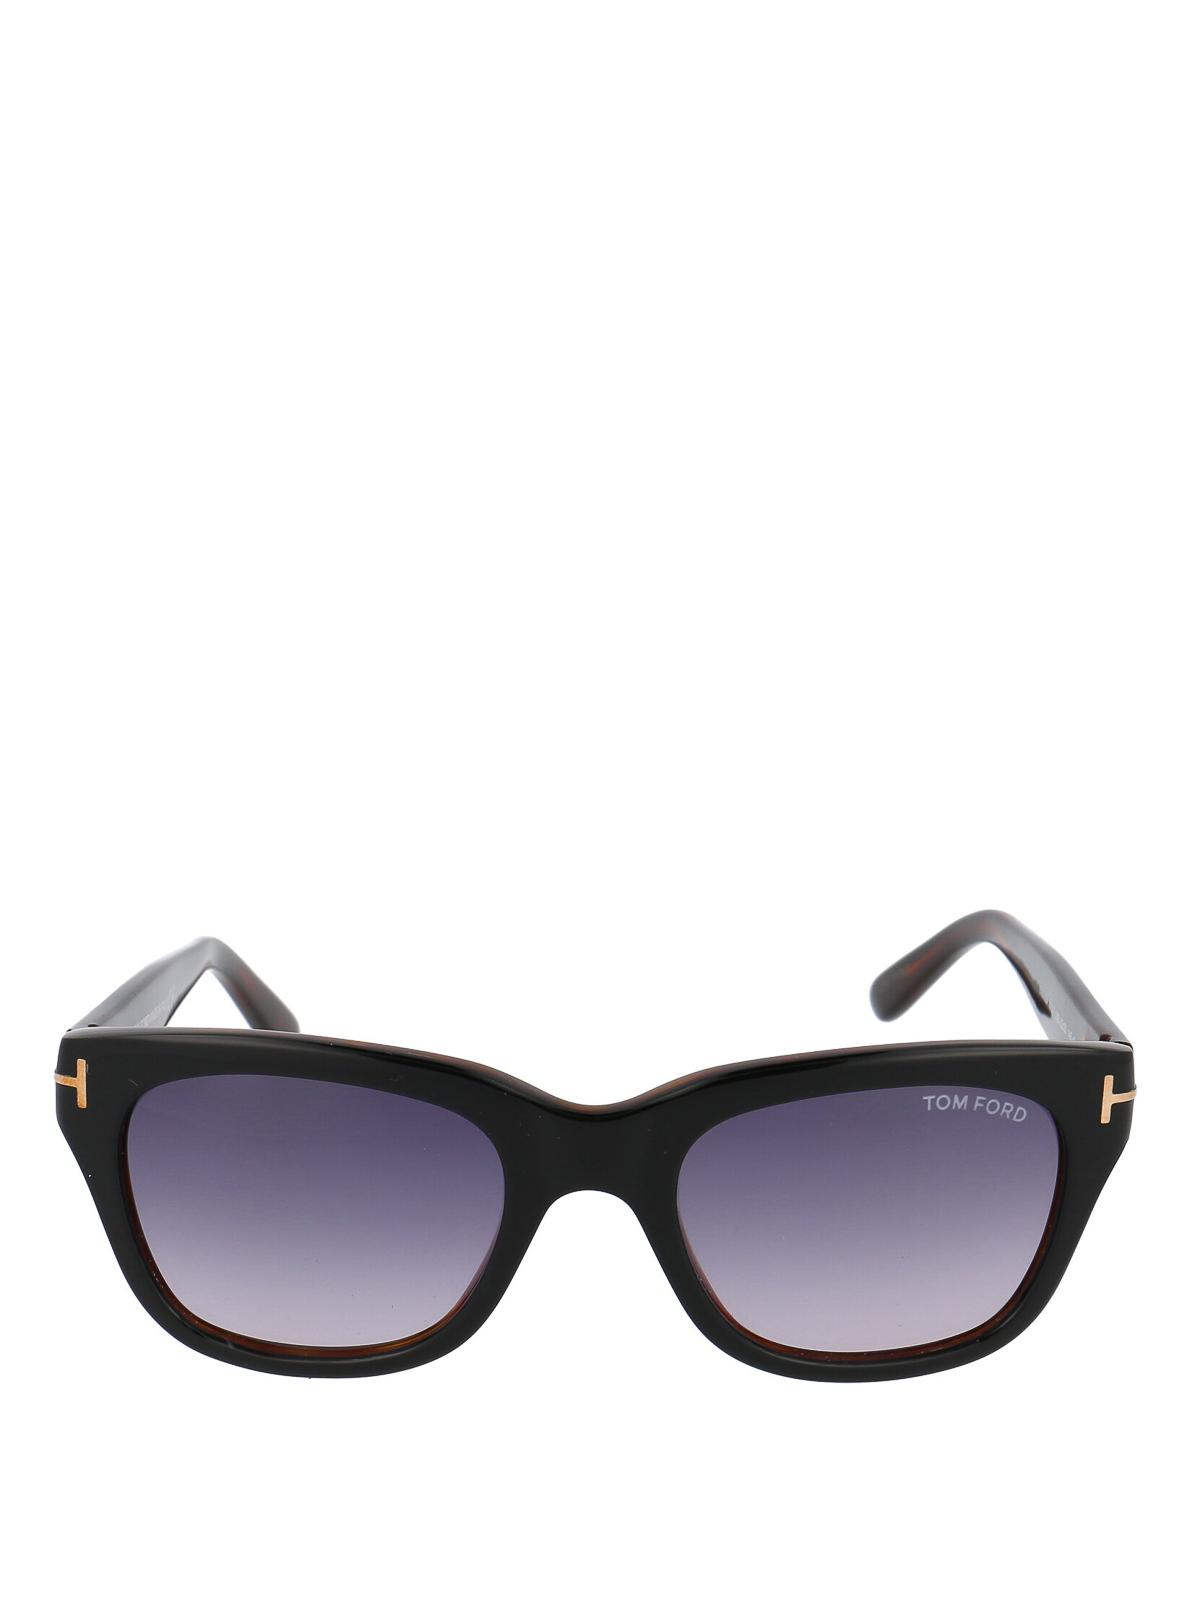 Tom Ford Havana Acetate Sunglasses Sunglasses Ft023705b Ikrix Com